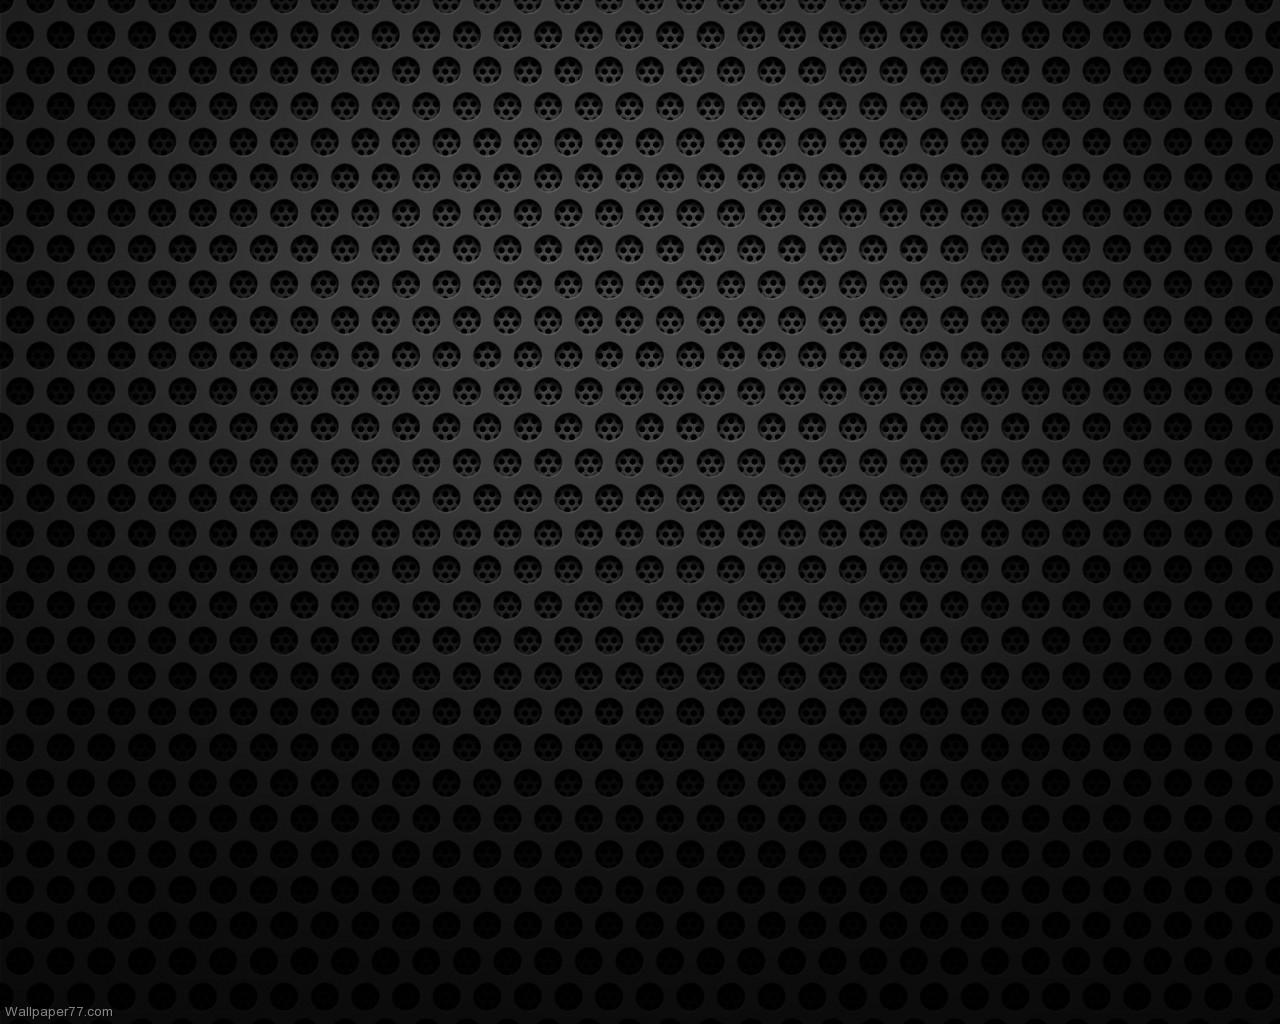 Black Hole ipad 3 wallpaper ipad wallpaper retina display wallpaper 1280x1024